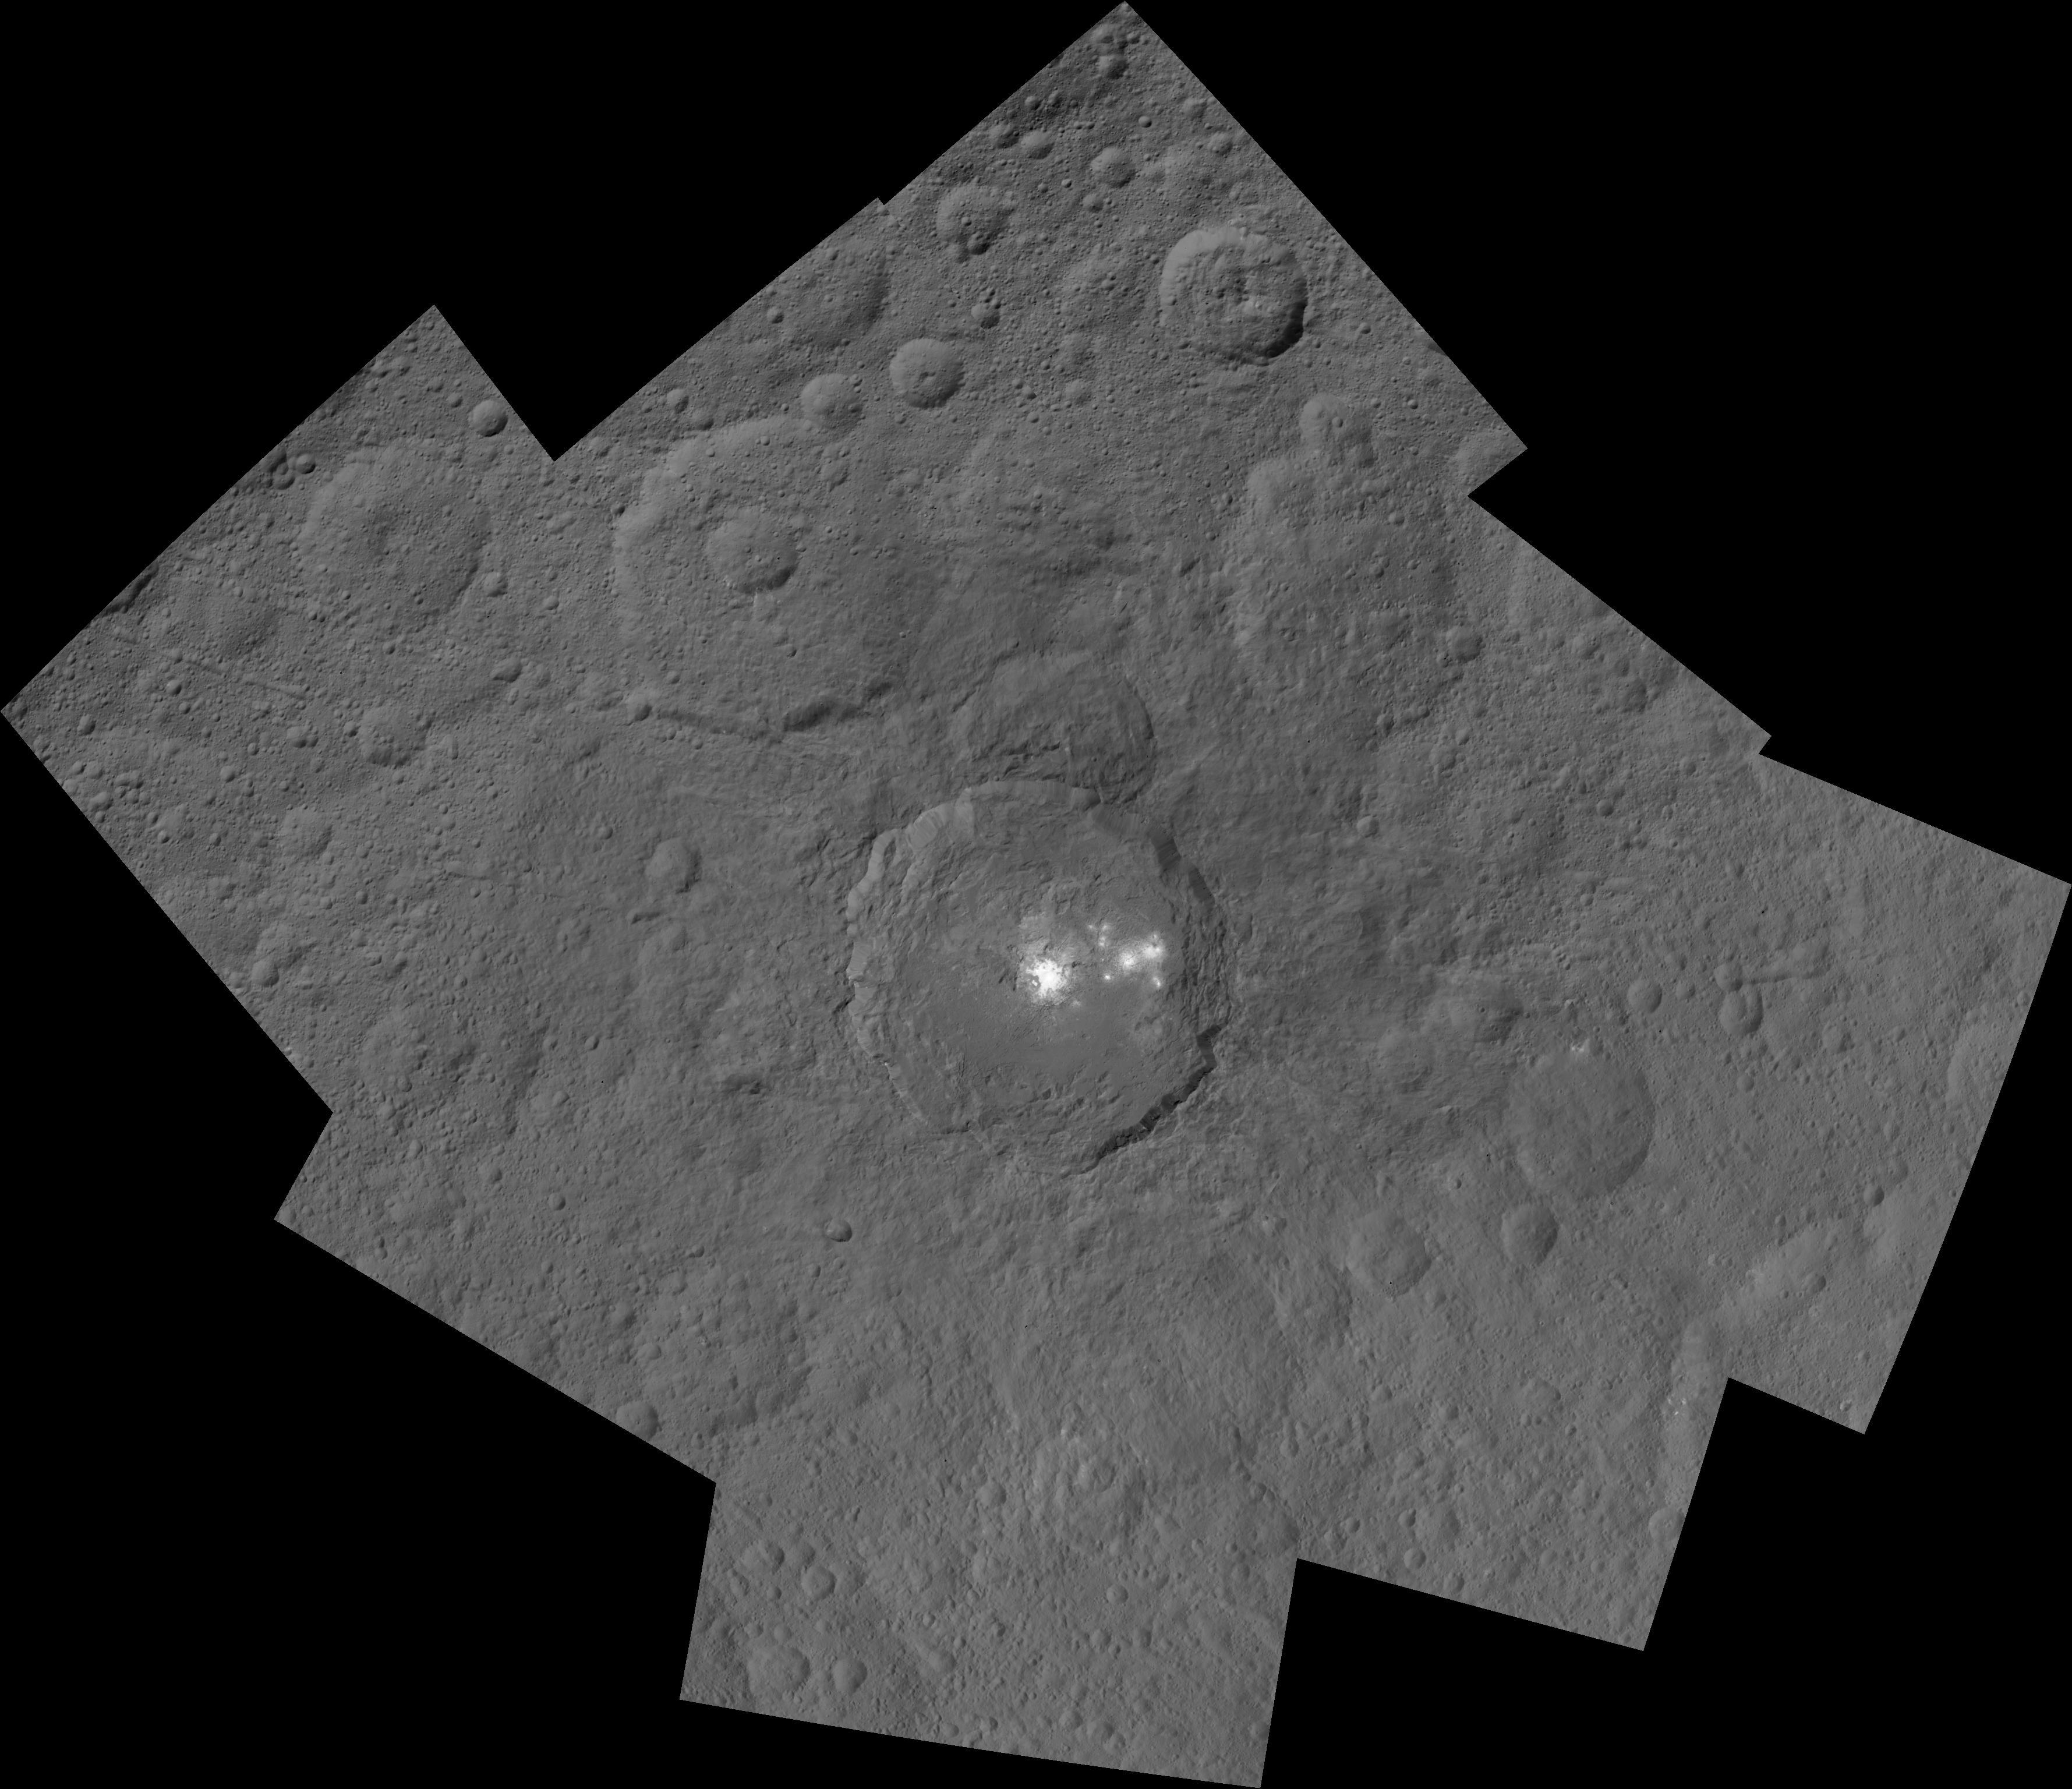 881869cb2 Bright Spots on Ceres: Mystery Solved? - Sky & Telescope